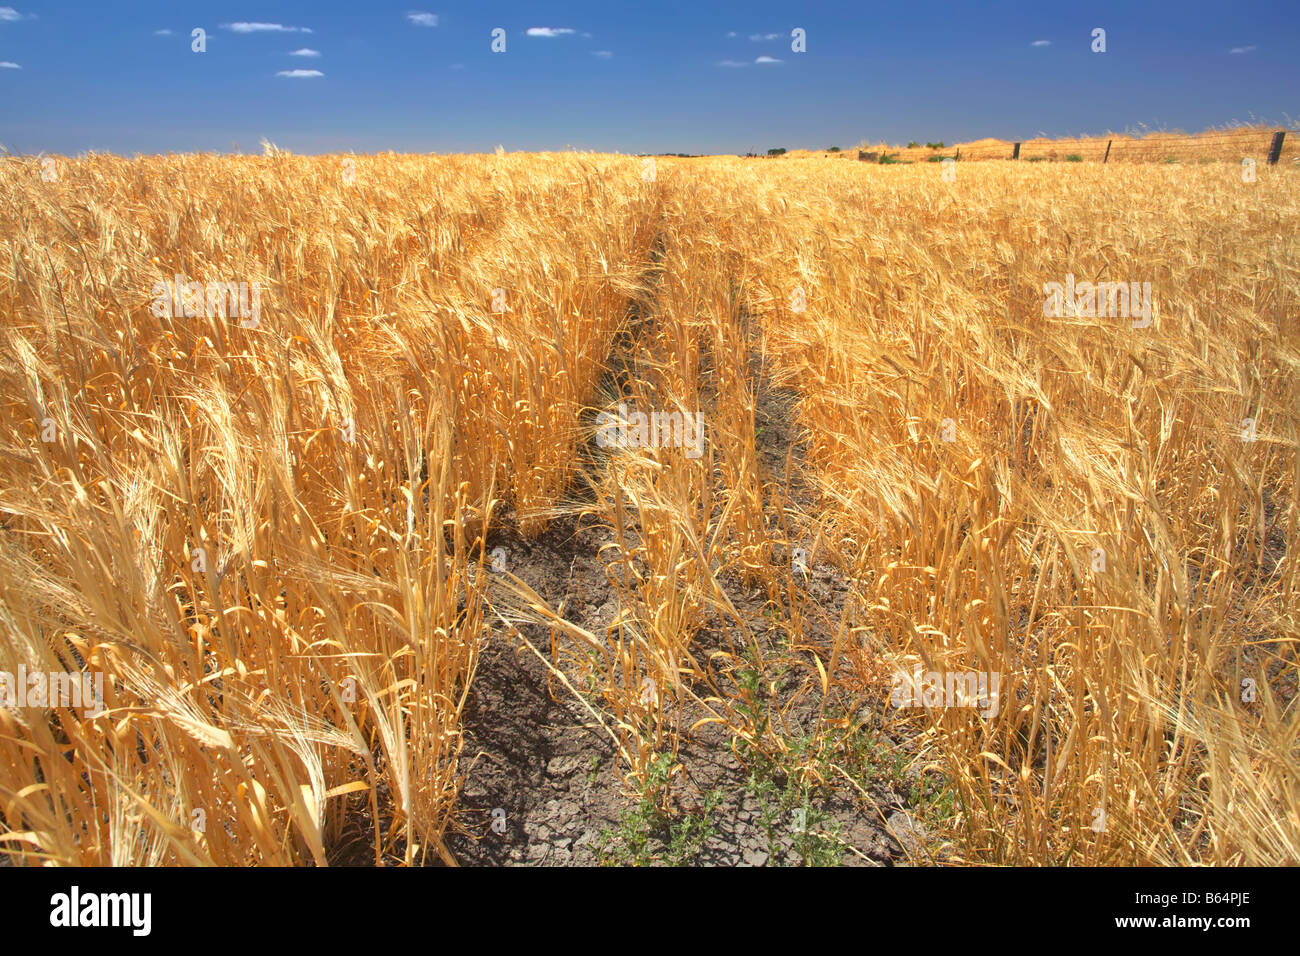 Narrung Wheat Field - Stock Image